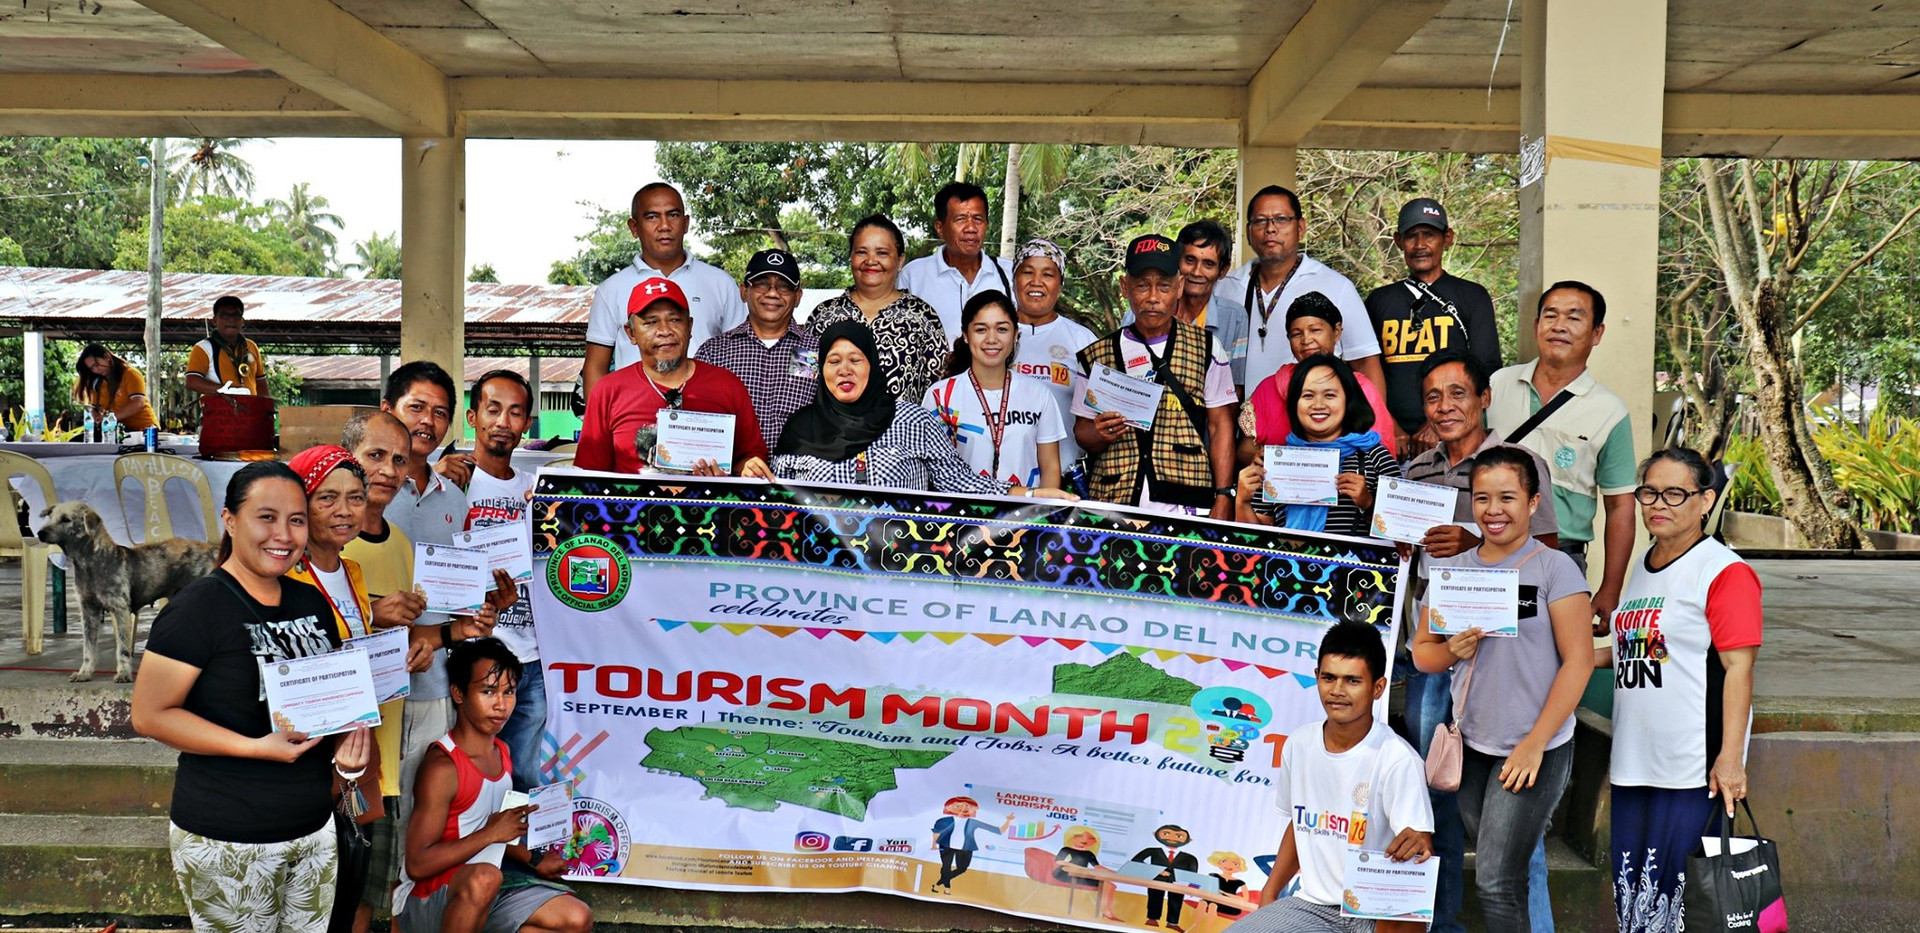 TourismMonth2019LDN (3).jpg